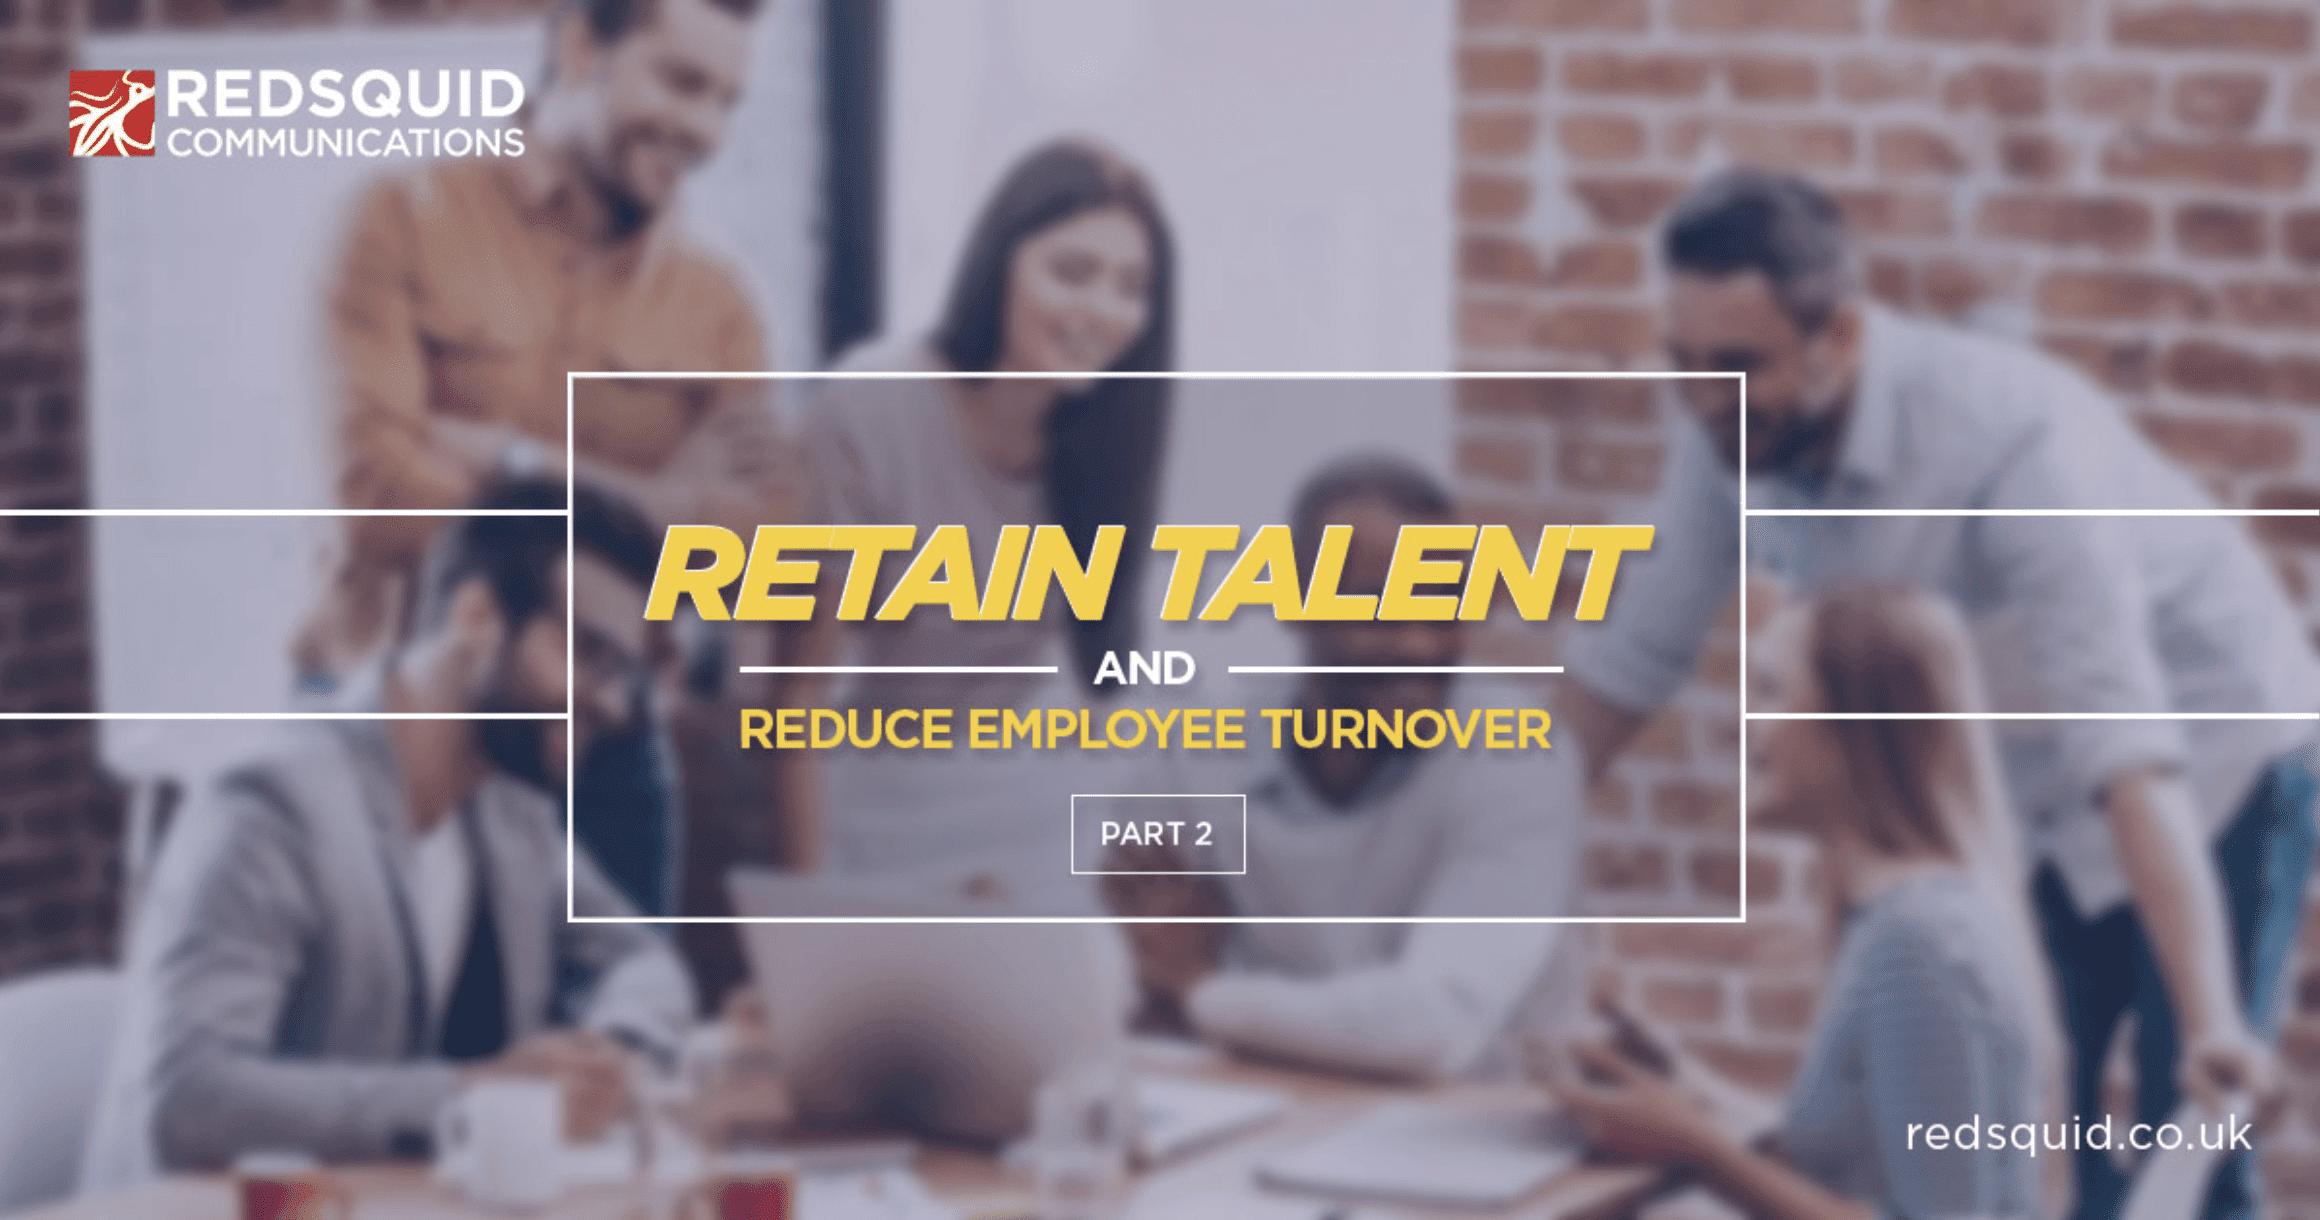 Reduce-employee-turnover